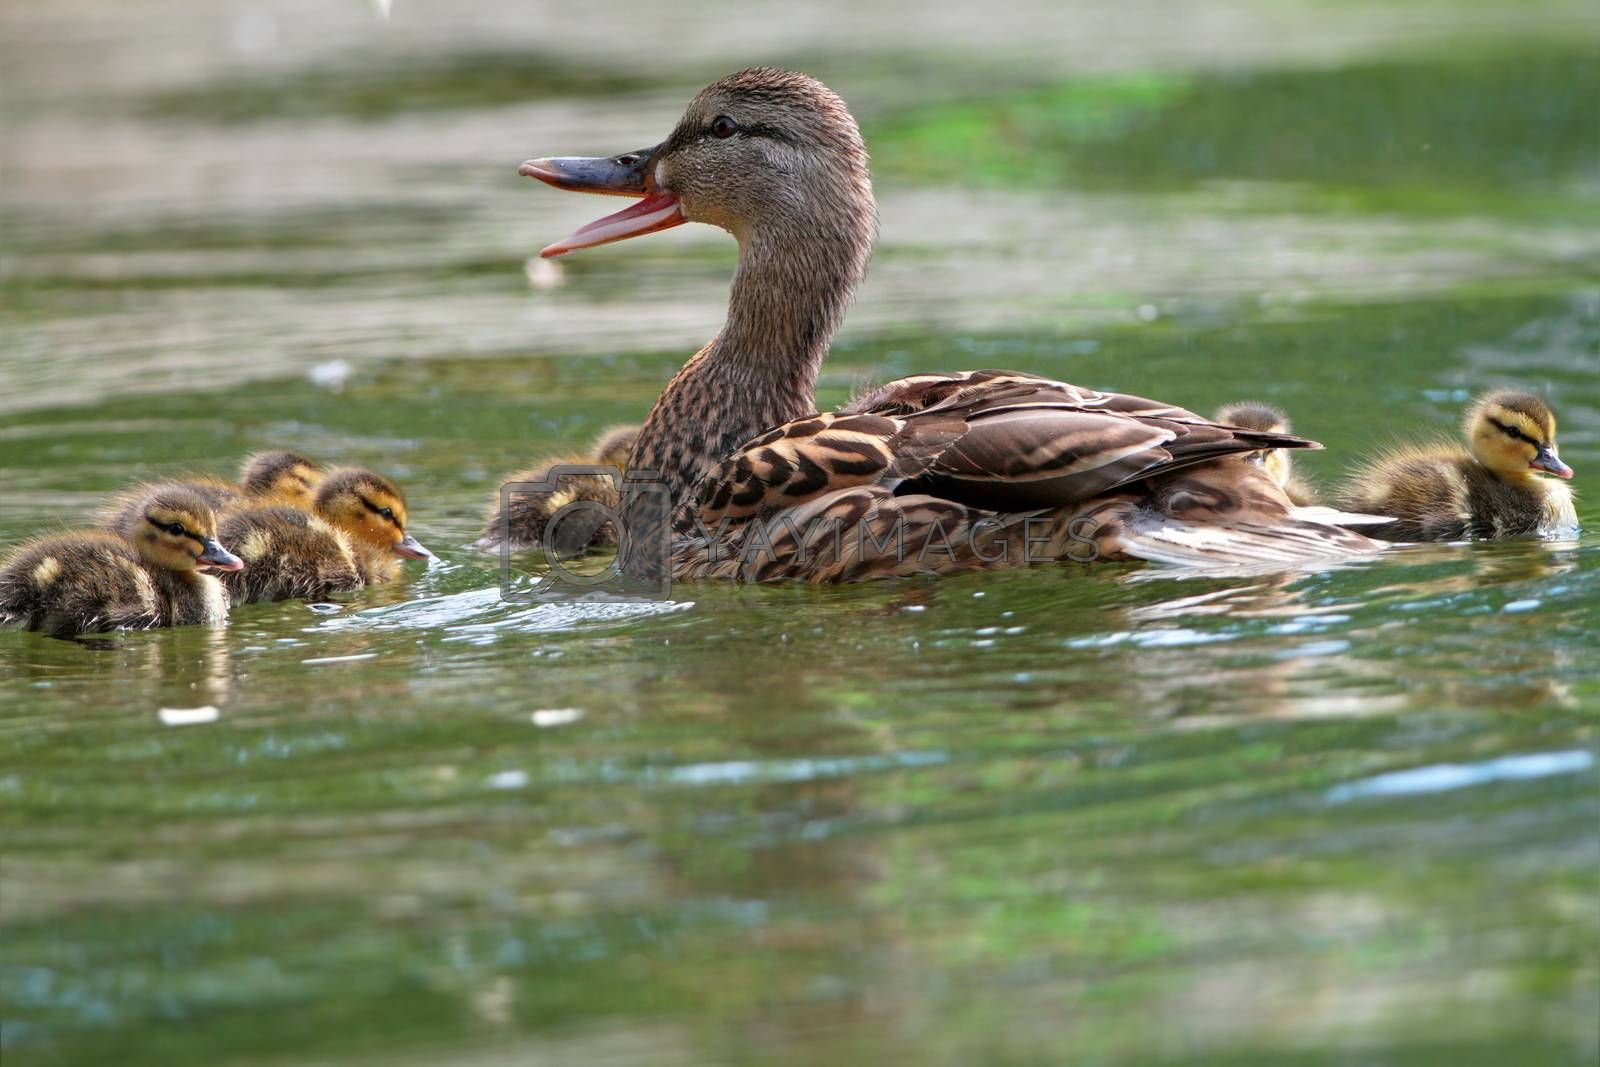 female mallard duck quacking ( anas platyrhtnchos ) with small cute ducklings on lake surface